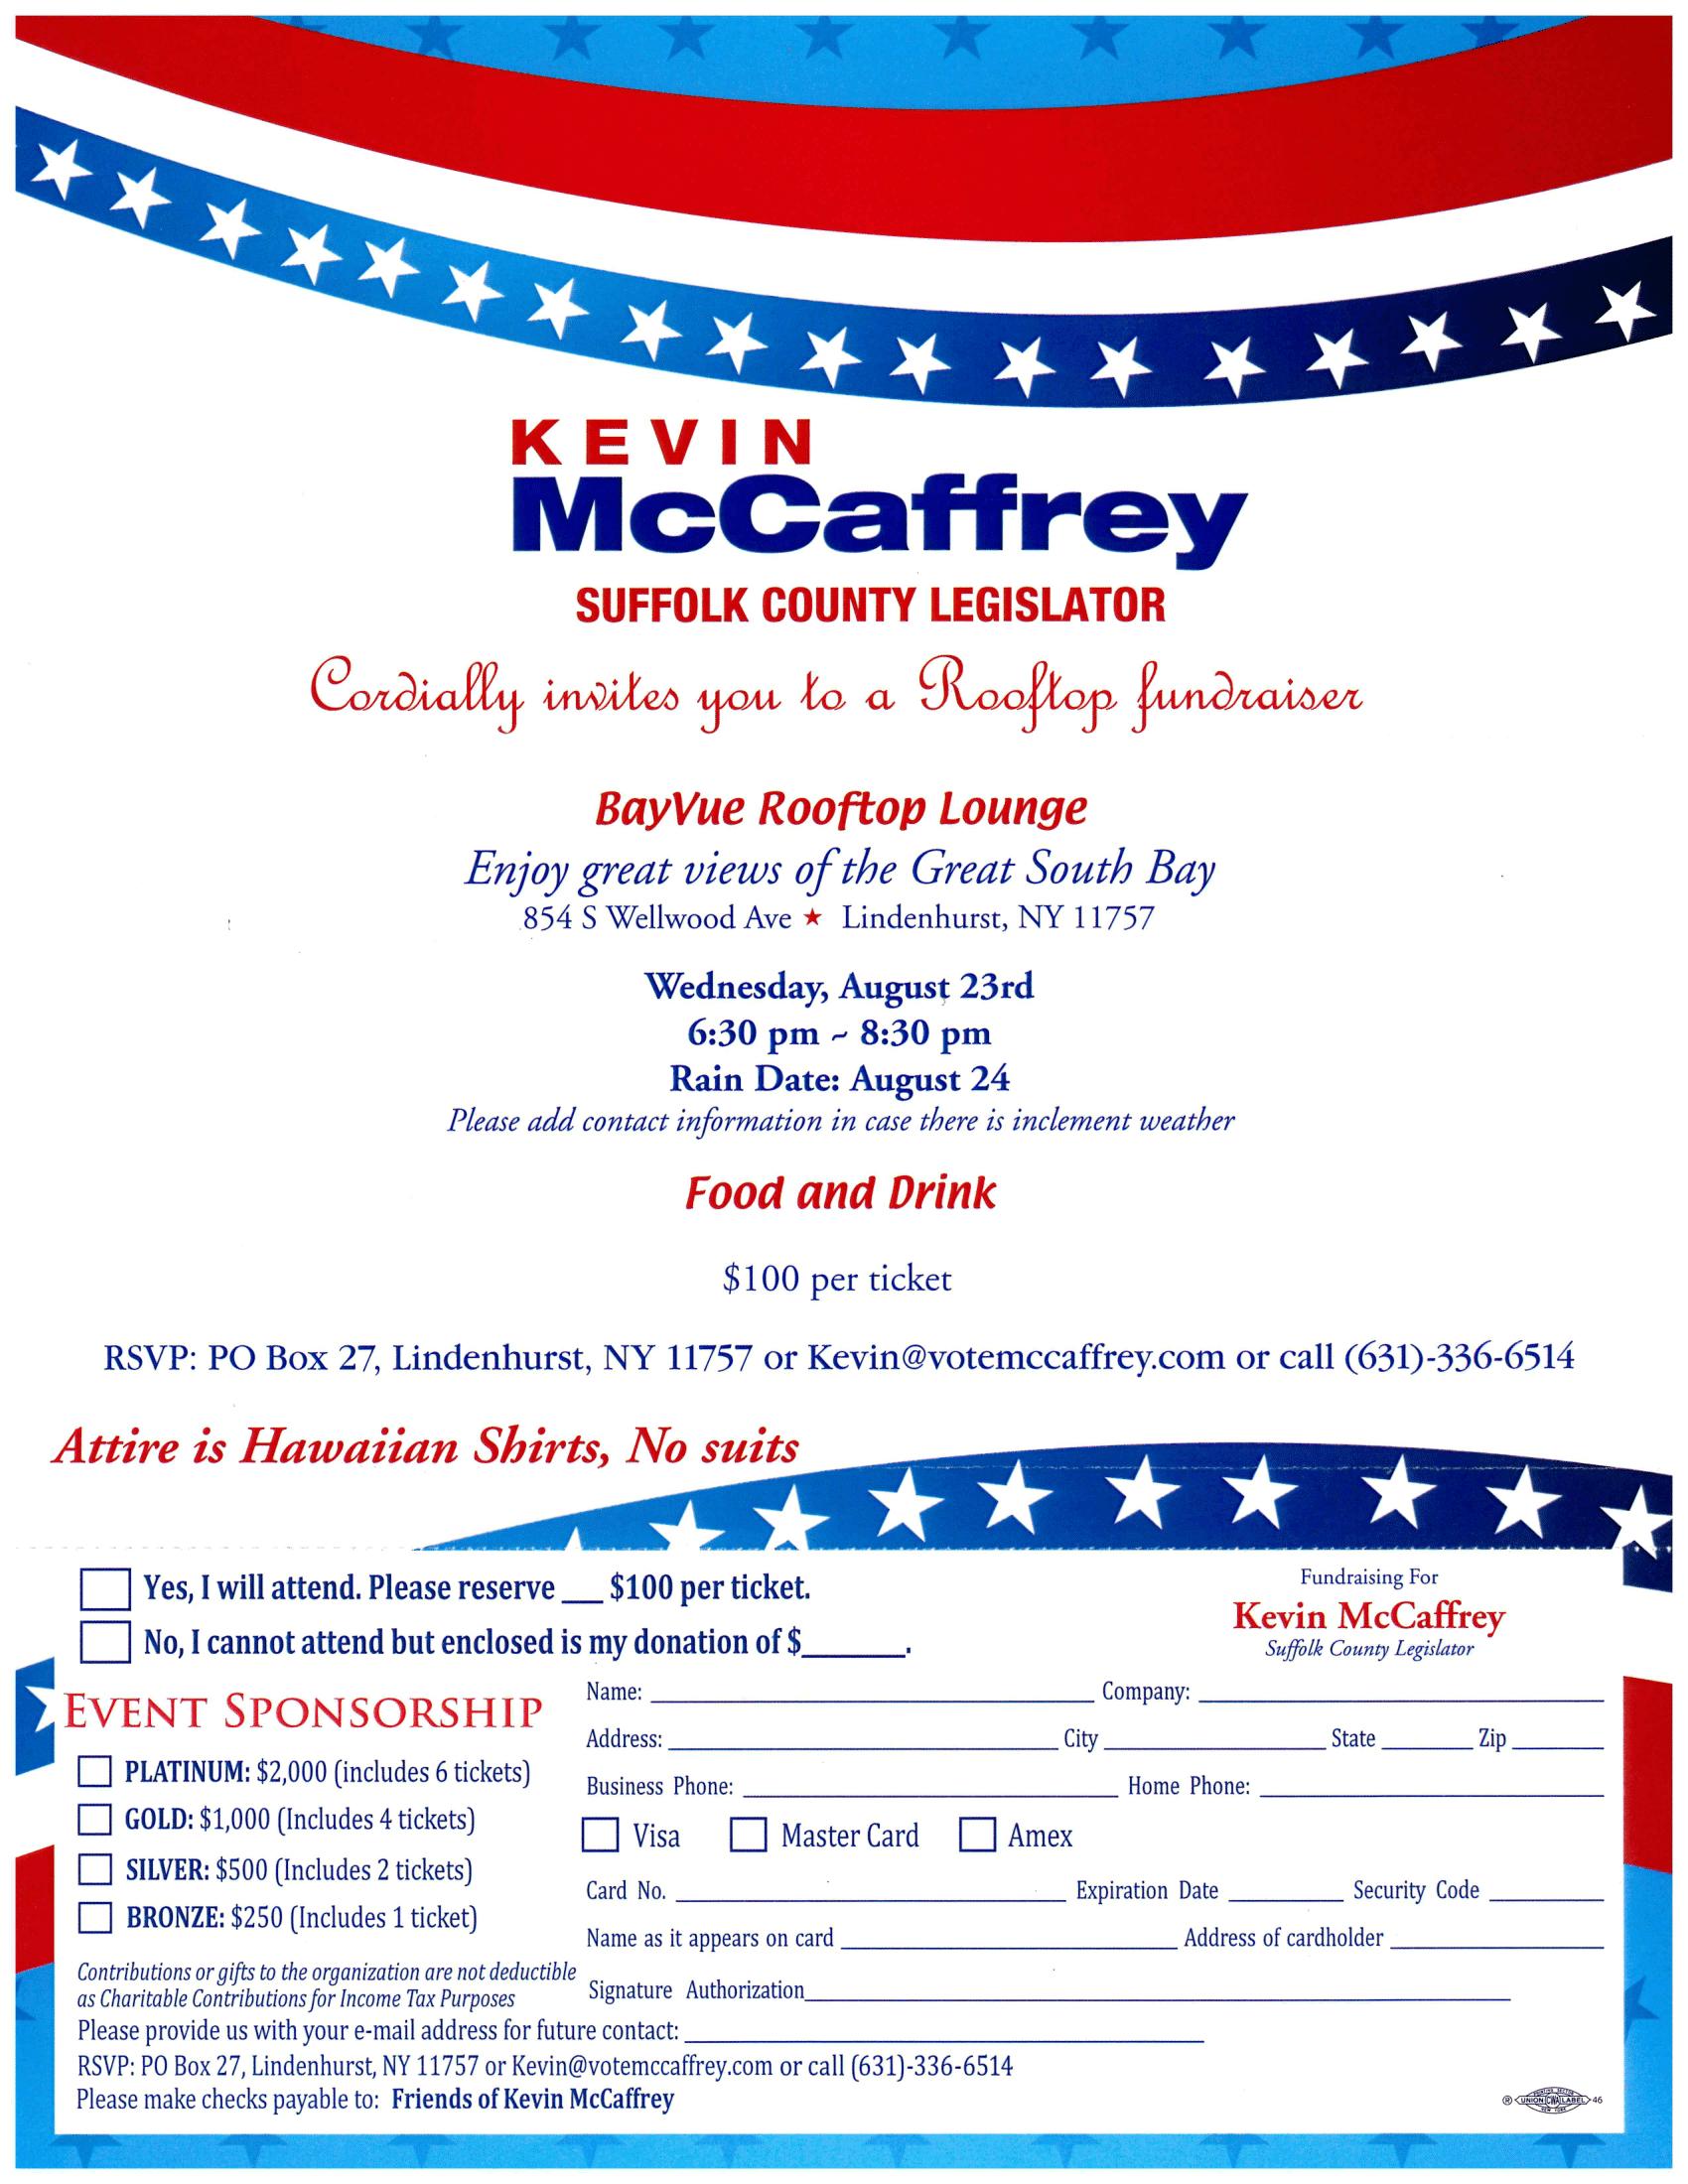 McCaffrey_8.23.17-1.png